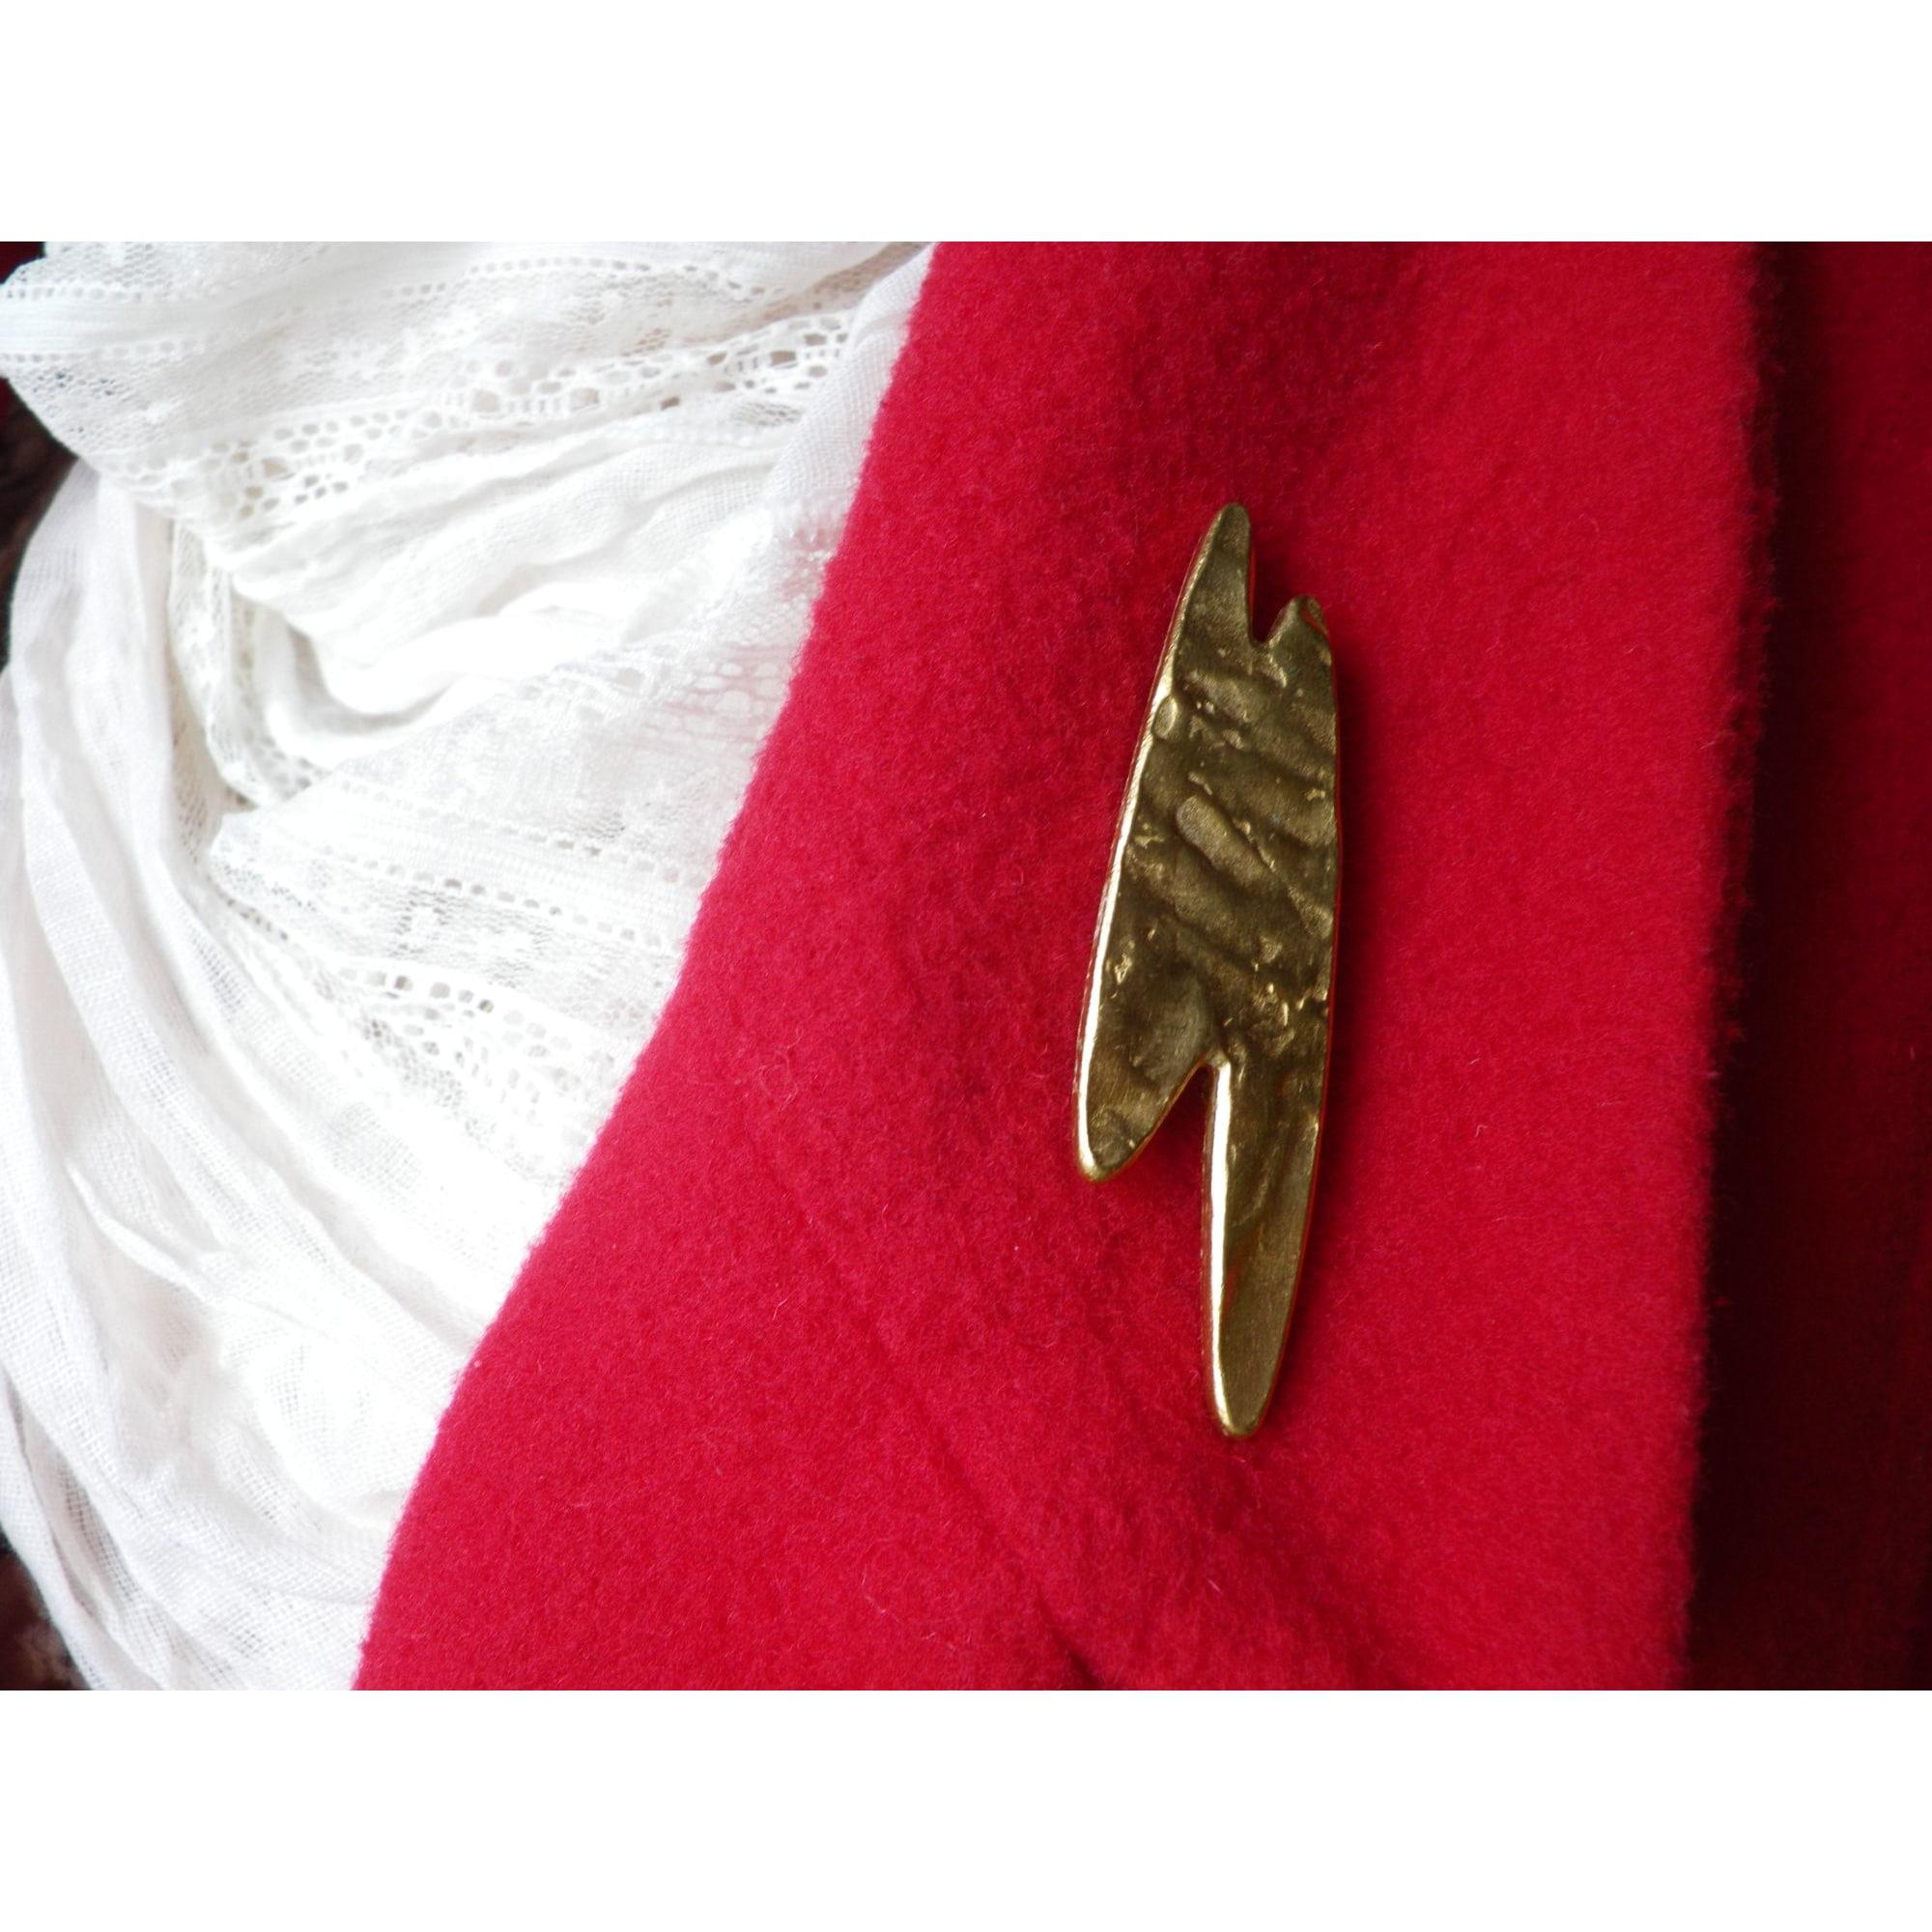 Broche BICHE DE BÈRE Doré, bronze, cuivre